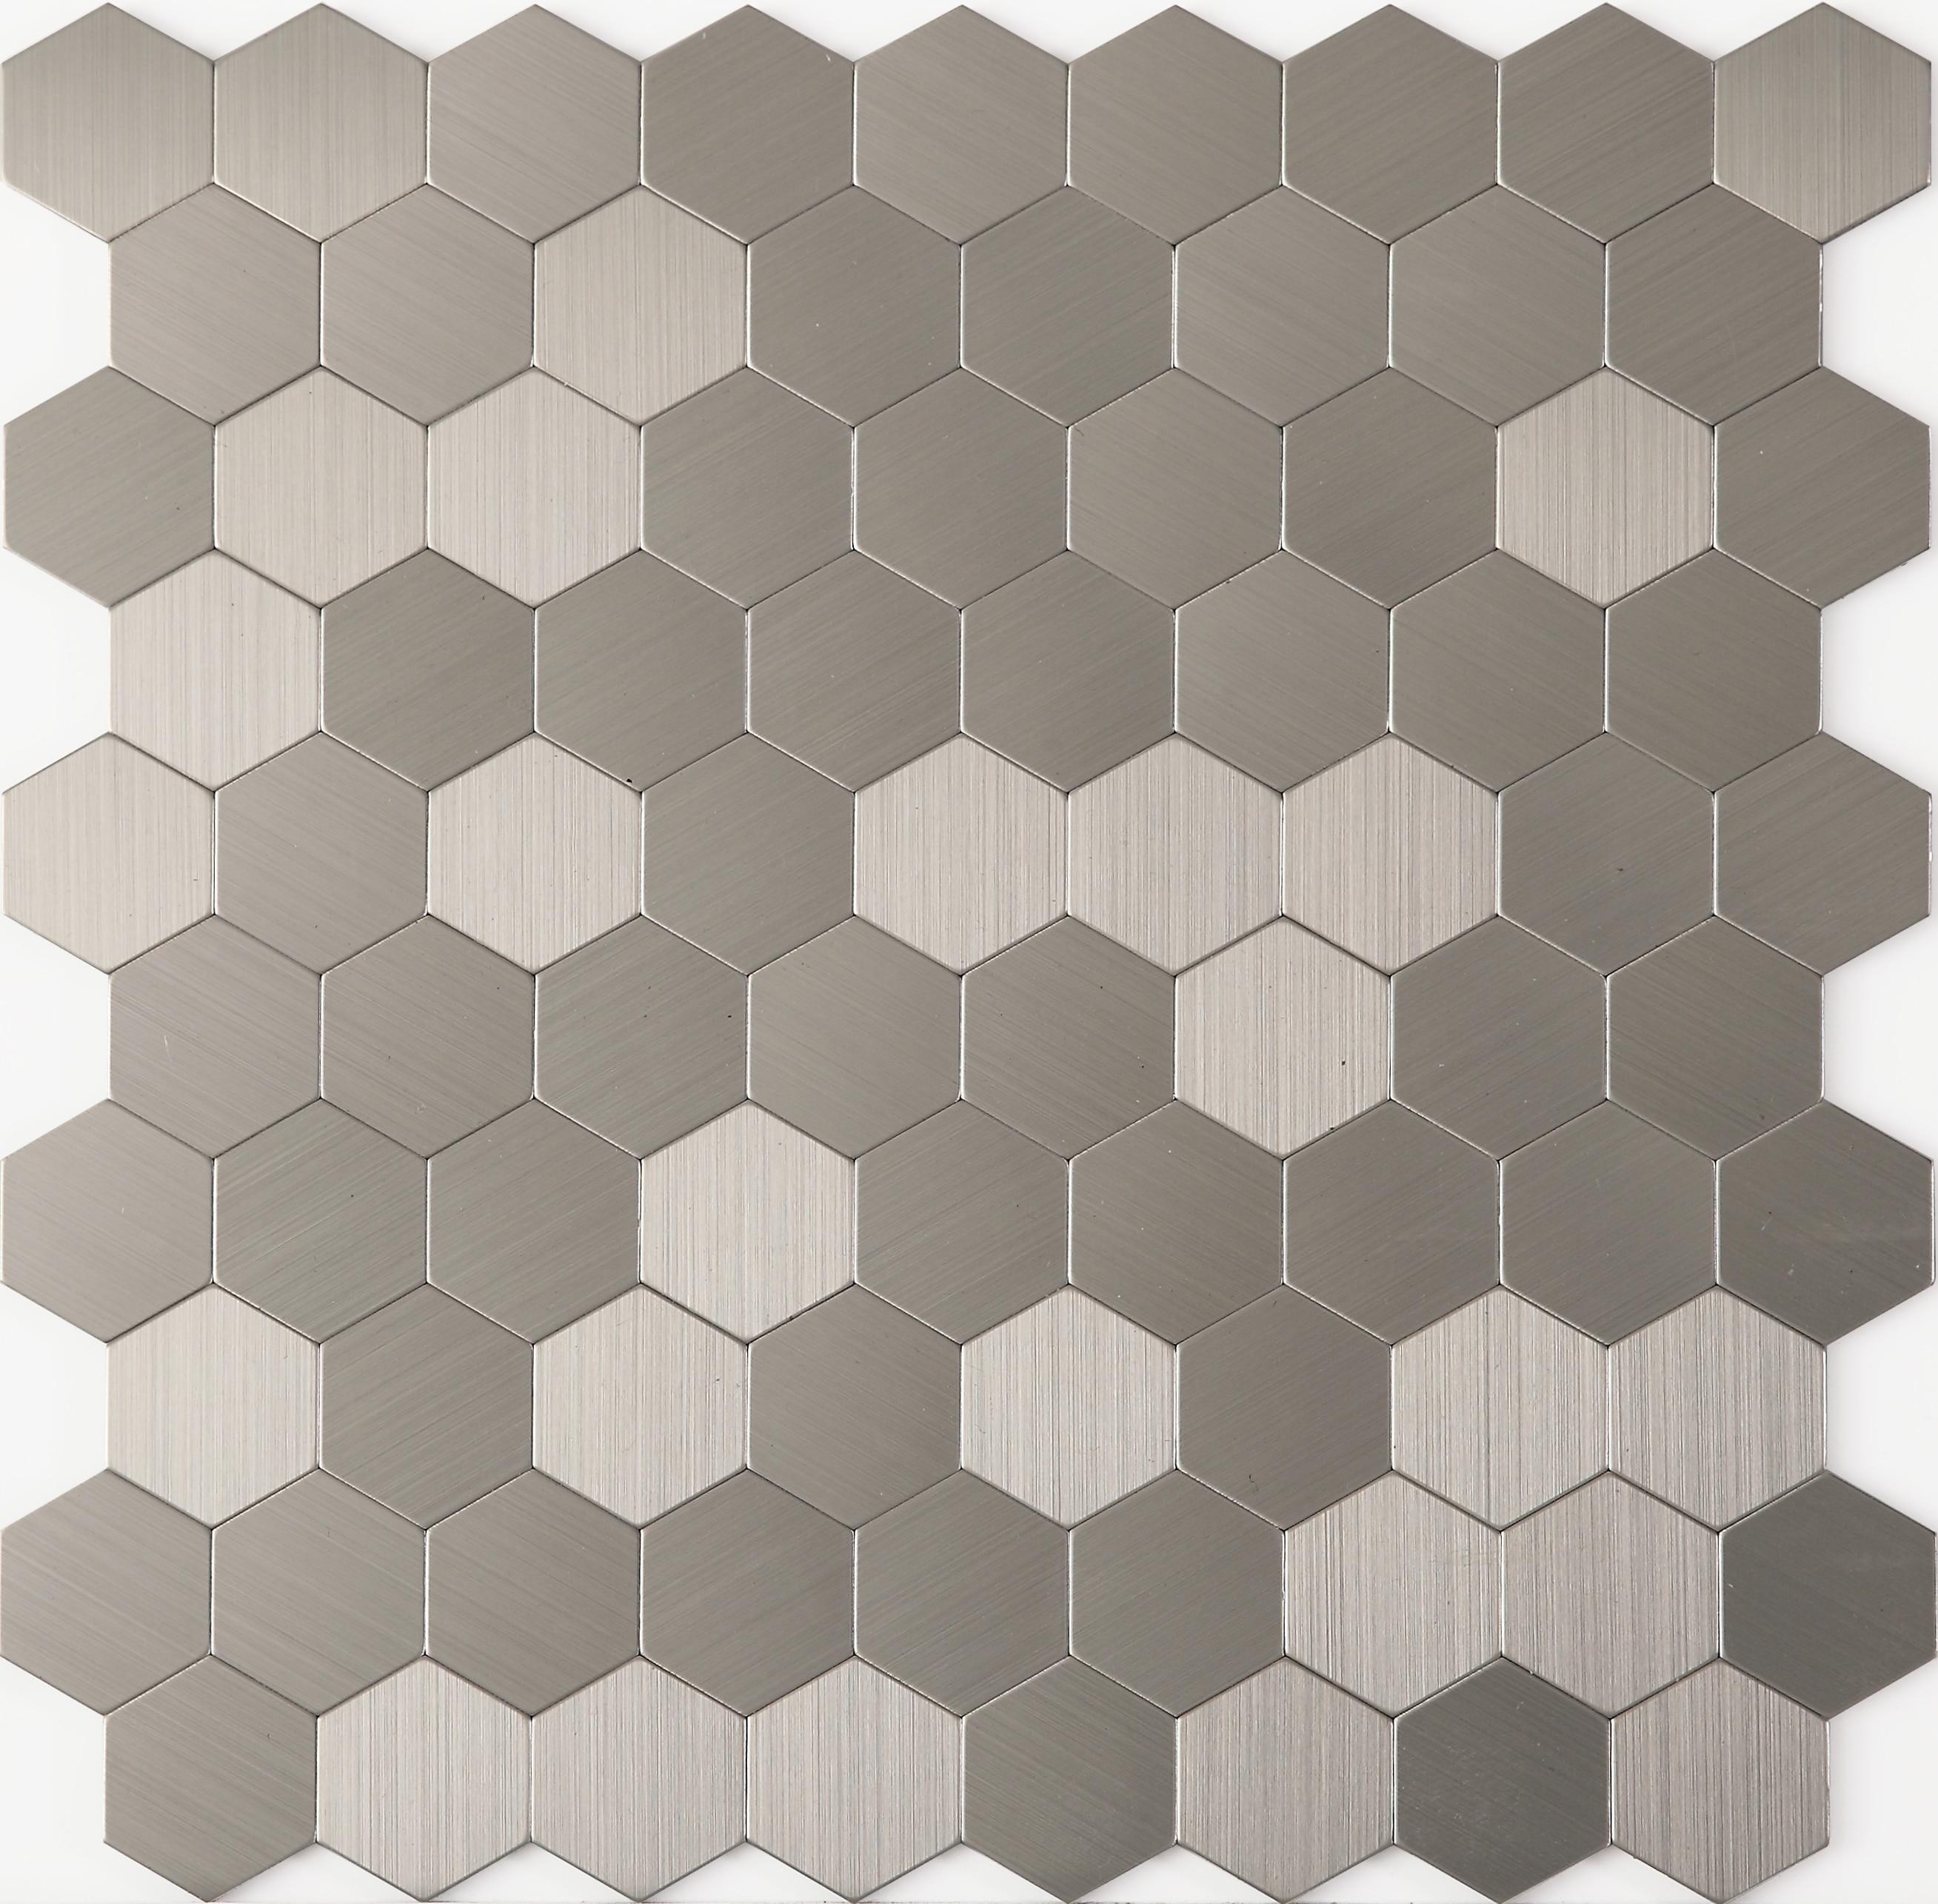 Kitchen Backsplash Tiles Hexagon